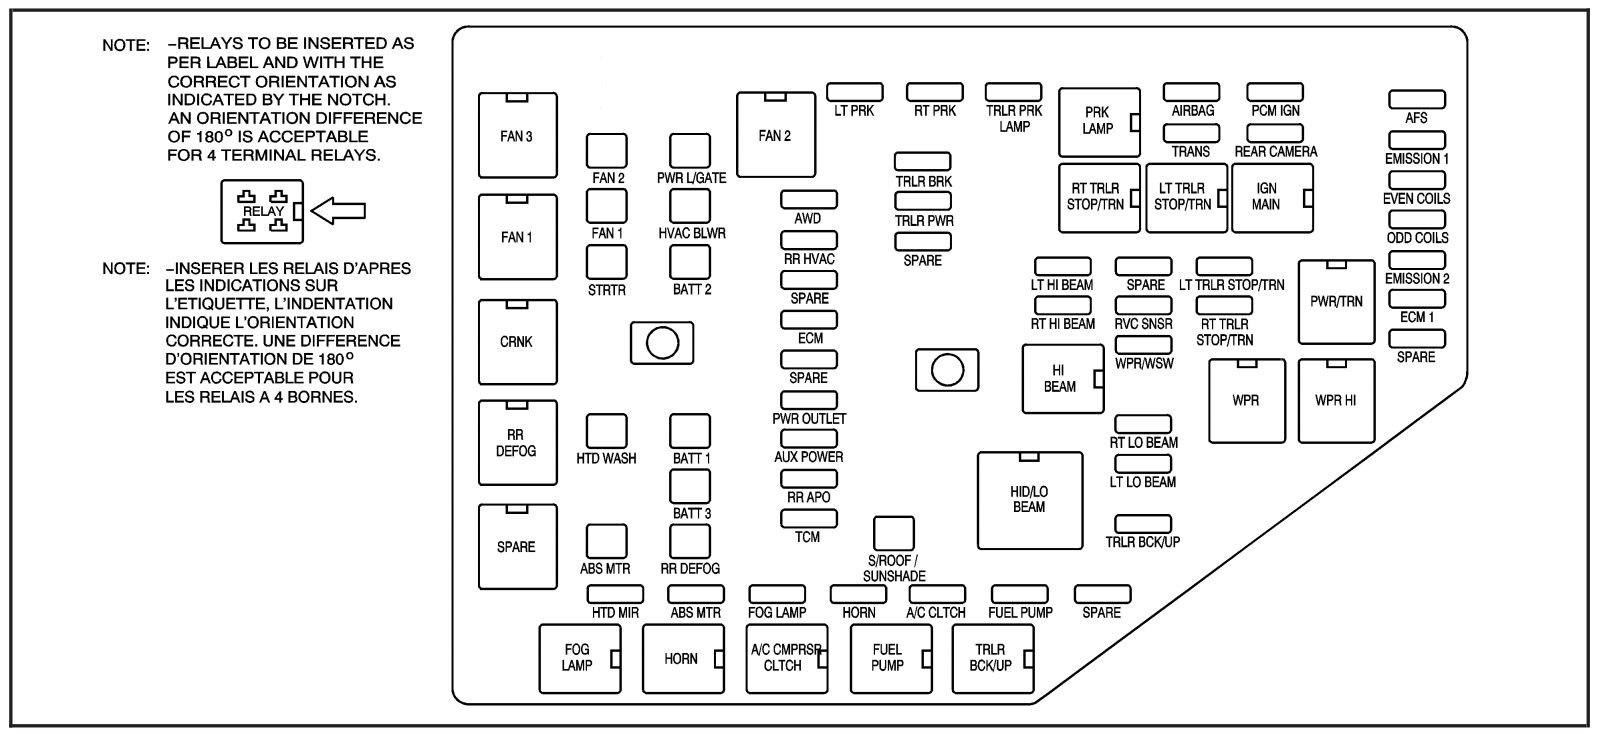 Fuse Box Diagram Together With 2005 Dodge Ram 2500 Wastegate Solenoid